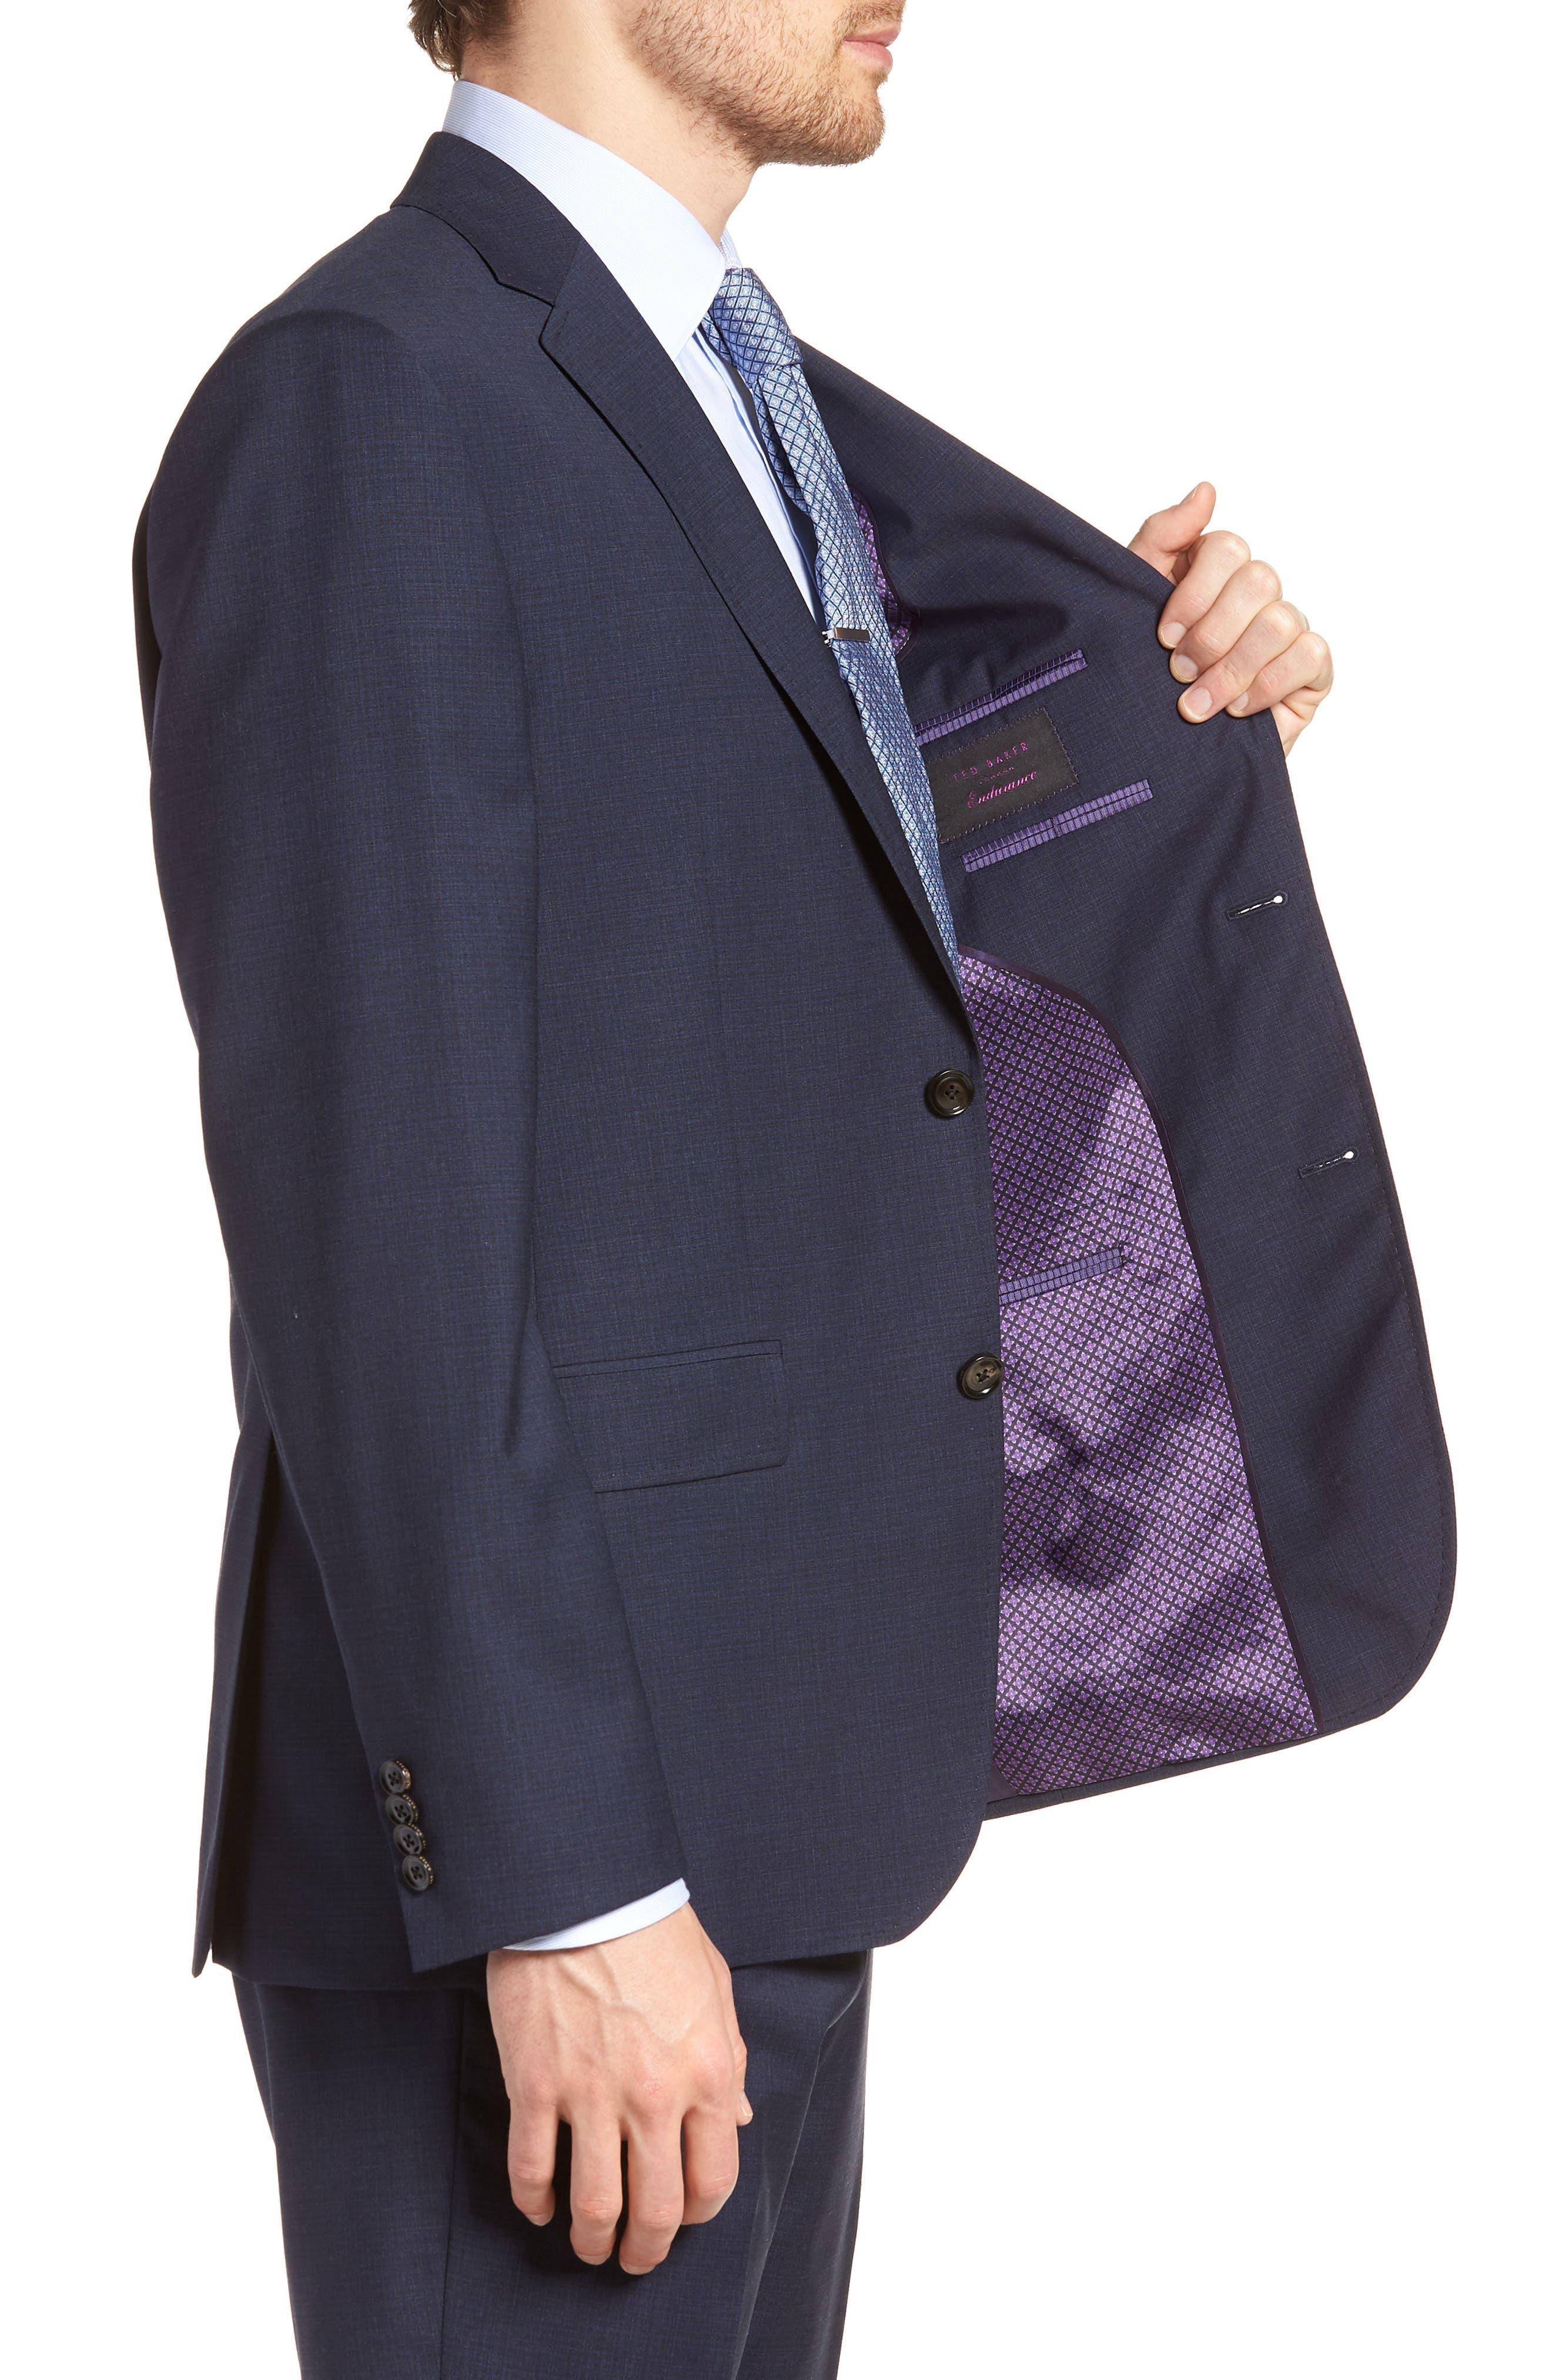 Jay Trim Fit Solid Wool Suit,                             Alternate thumbnail 4, color,                             400